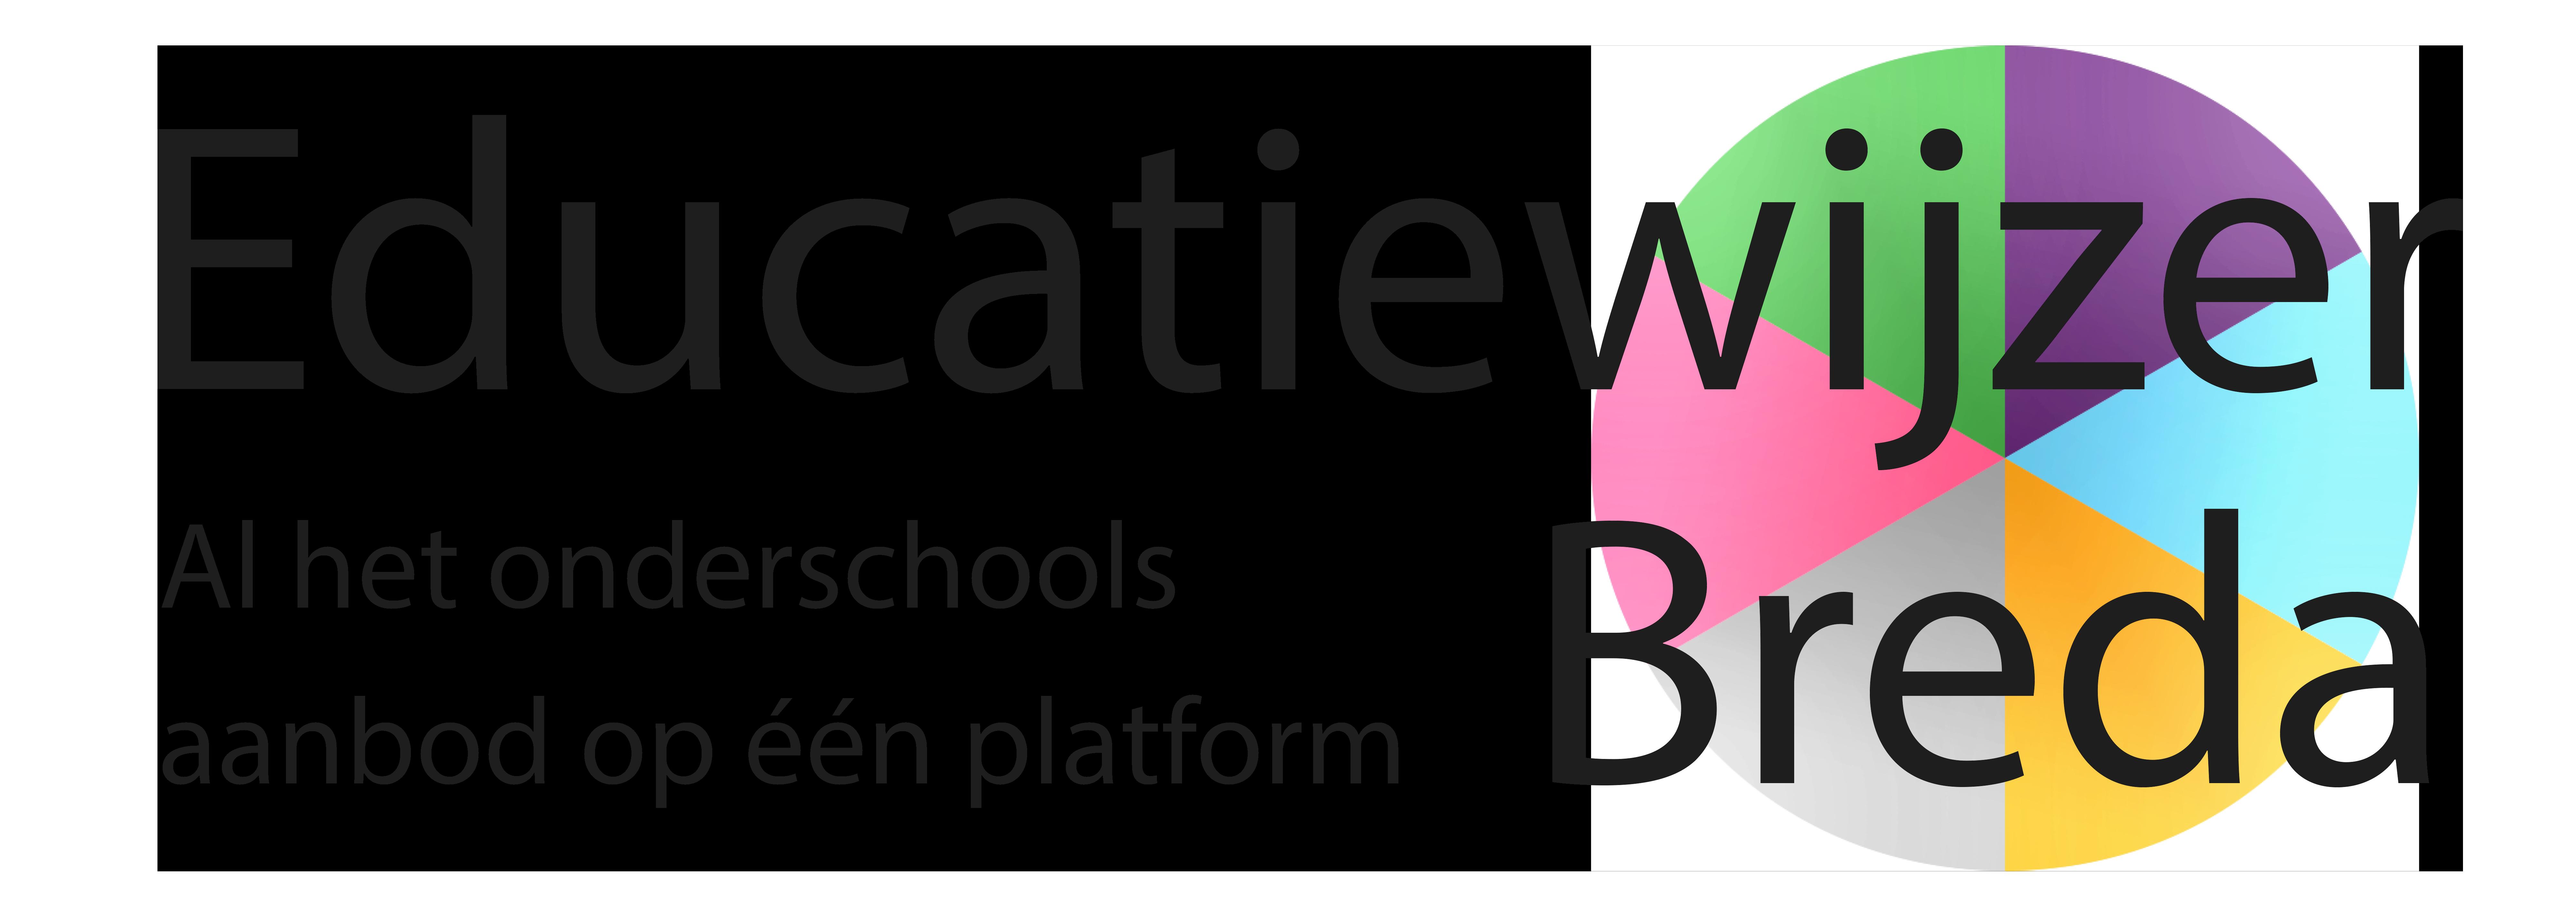 Logo Educatiewijzer Breda